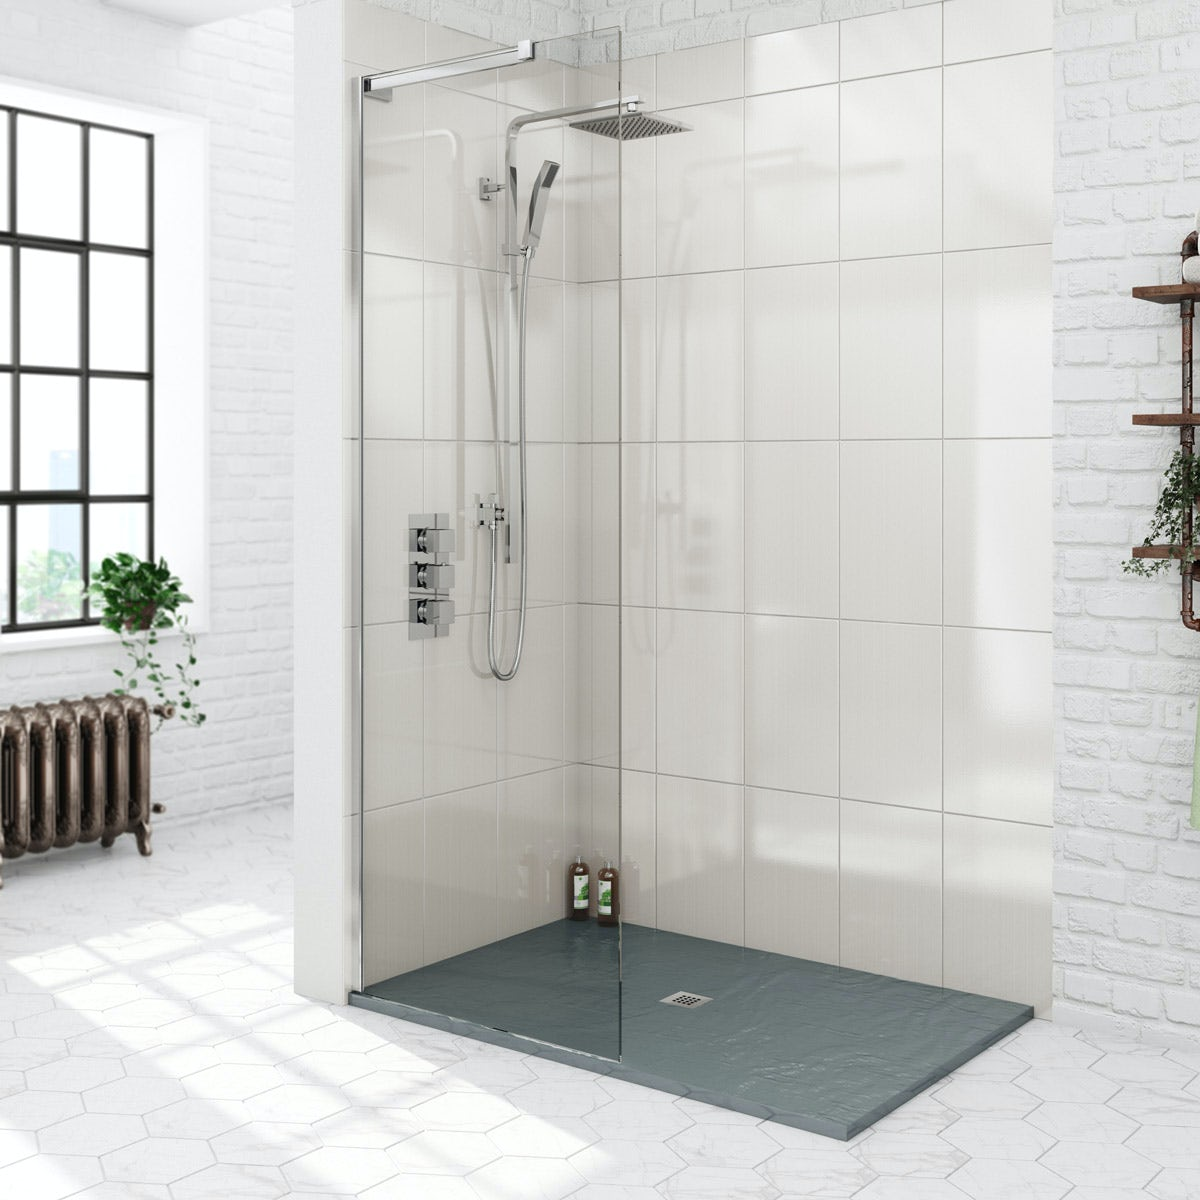 Mode 8mm Walk In Shower Glass Screen With Grey Slate Effect Tray |  VictoriaPlum.com